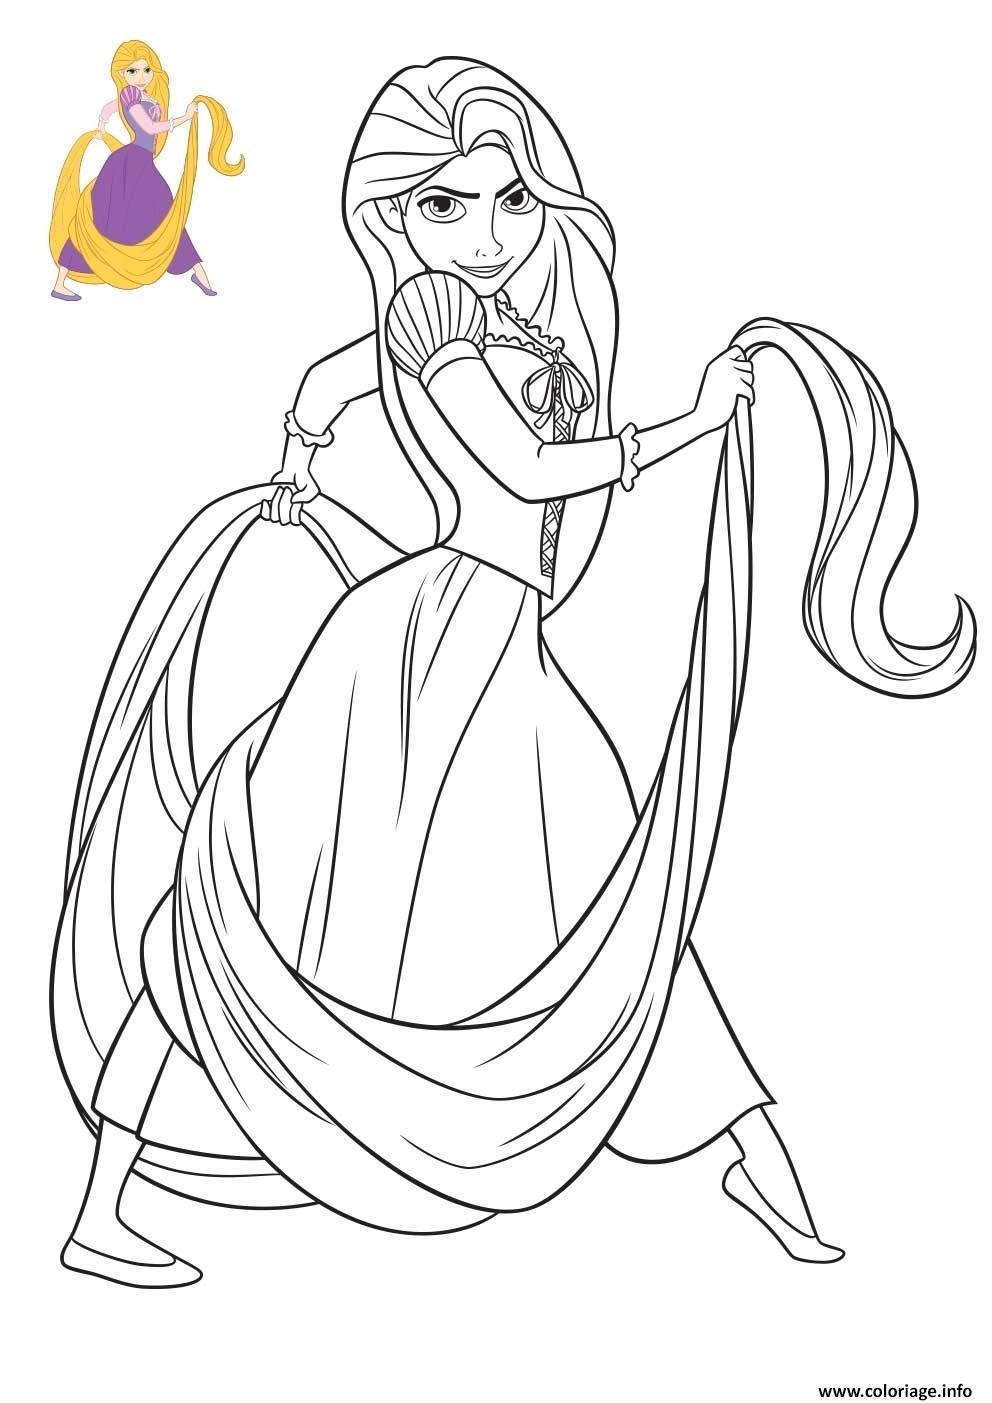 Coloriage princesse disney reponse - Coloriage de princesse disney ...